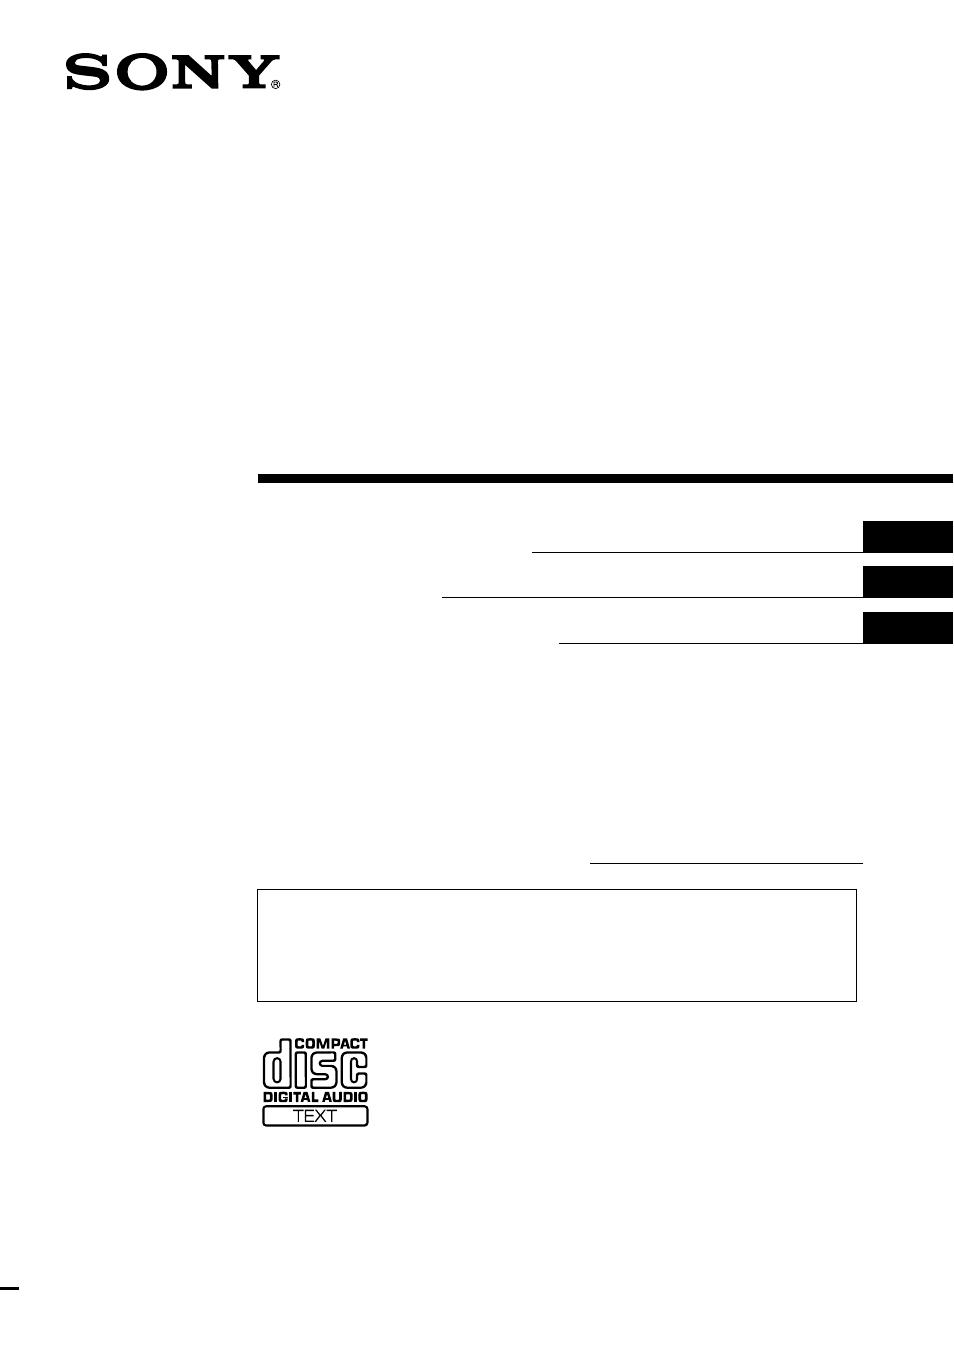 sony cdx m620 wiring diagram wiring diagramsony cdx m670 user manual 108 pagessony cdx m620 wiring diagram 21